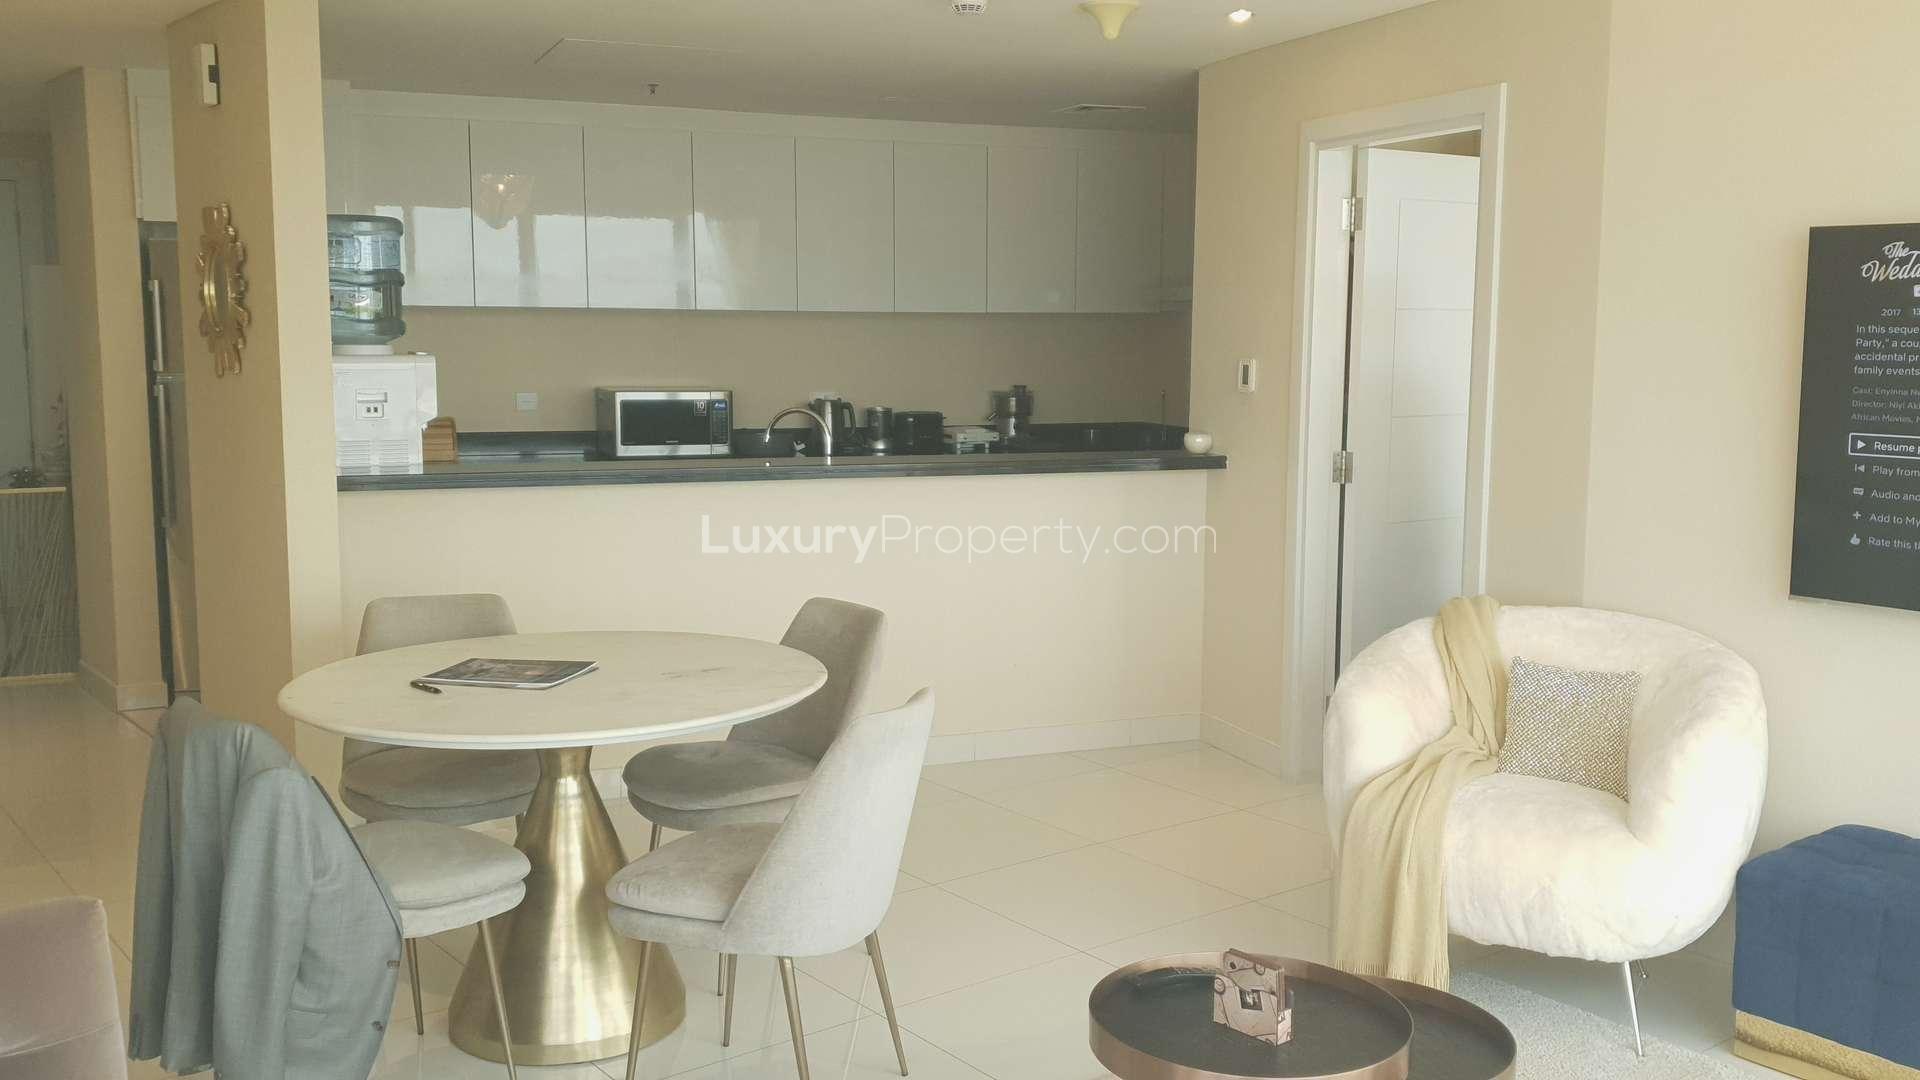 2 Bed Apartment For Rent In Damac Heights Dubai Marina Luxuryproperty Com,Playroom Storage Kids Toy Storage Ideas